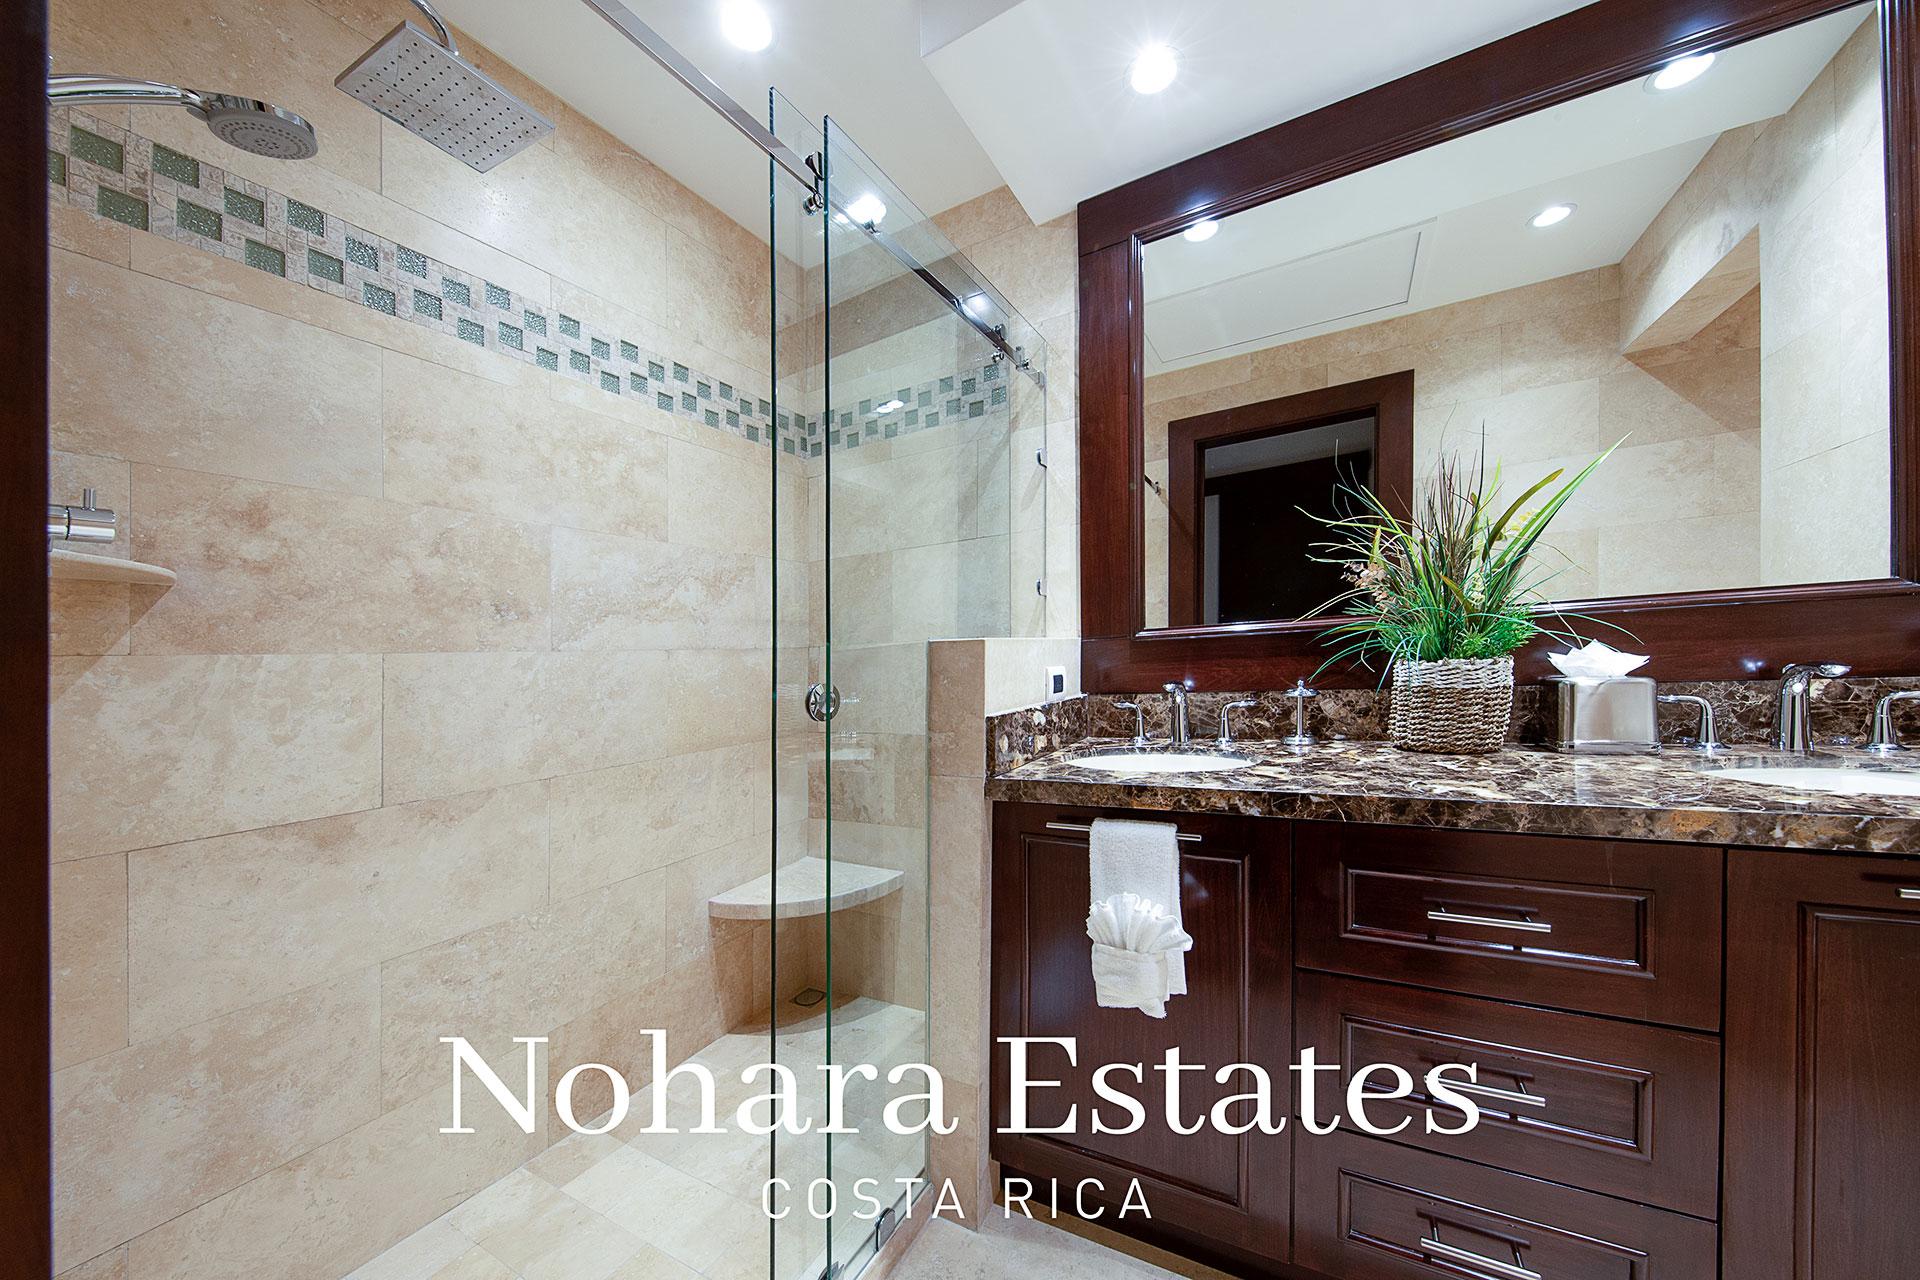 Nohara Estates Costa Rica 360 Esplendor Del Pacifico 8